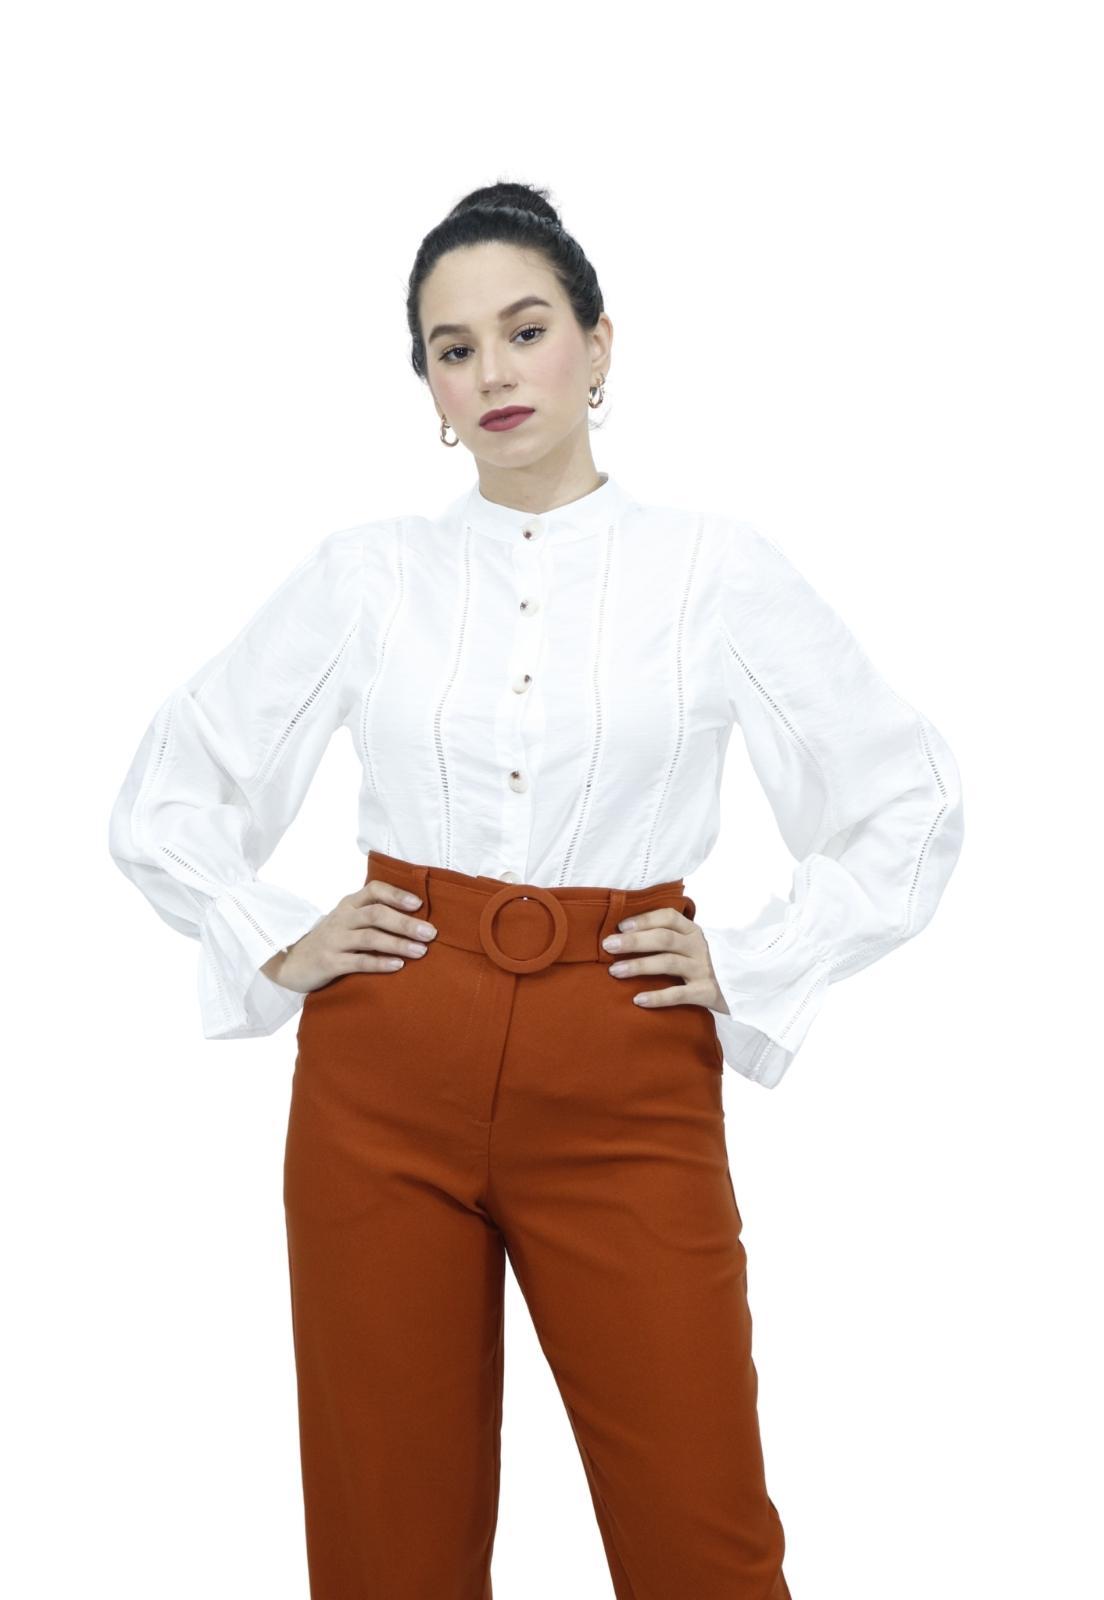 Camisa Feminina Manga Longa Punho Babado Renda Romântica